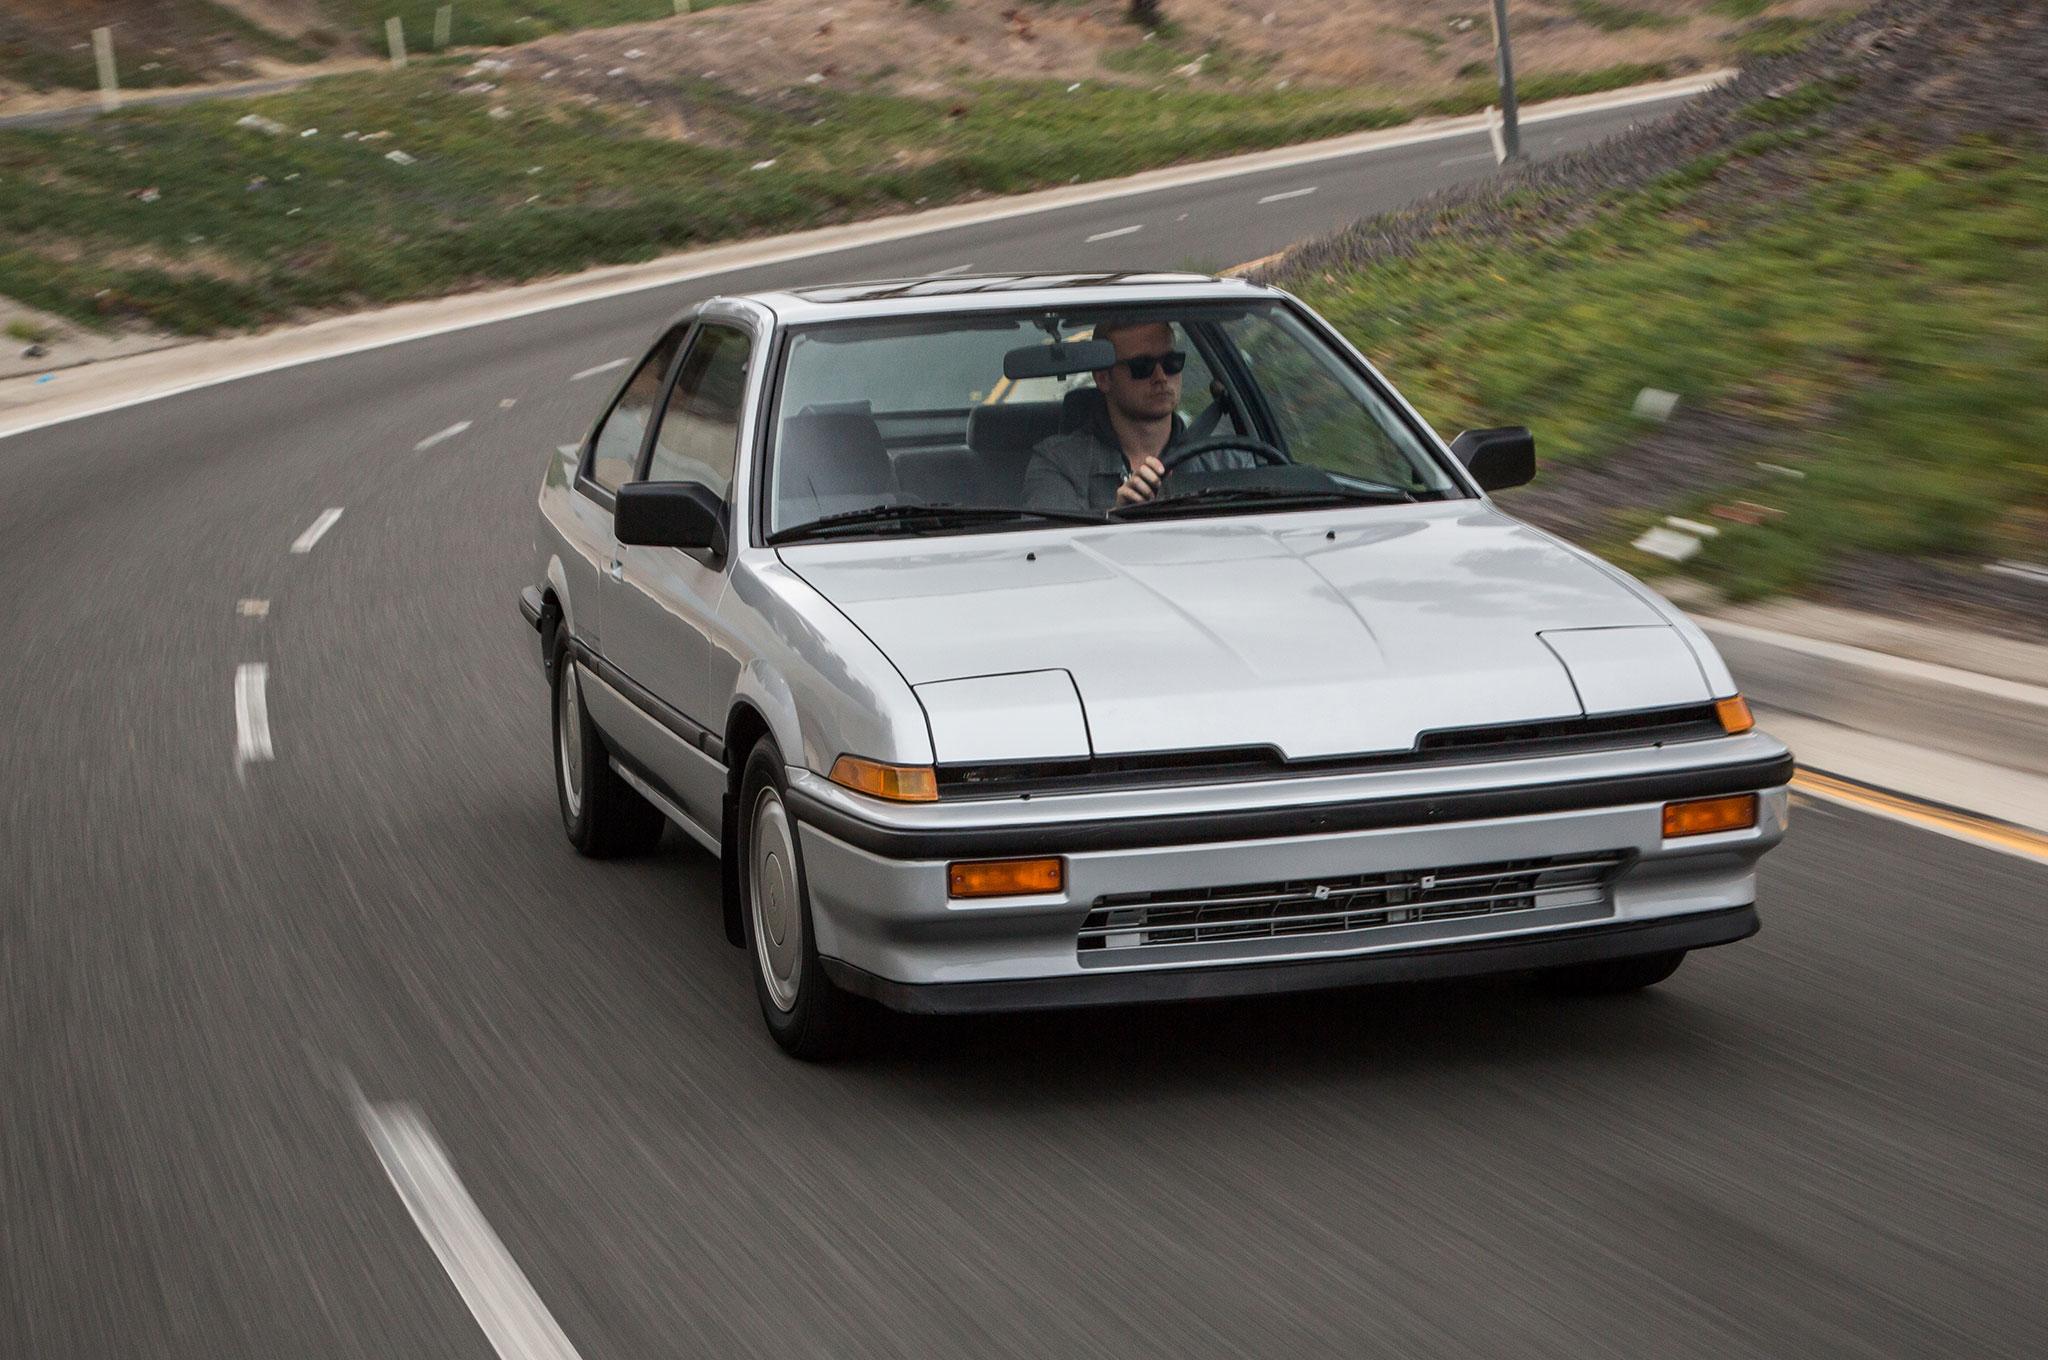 Collectible Classic: 1986-1989 Acura Integra